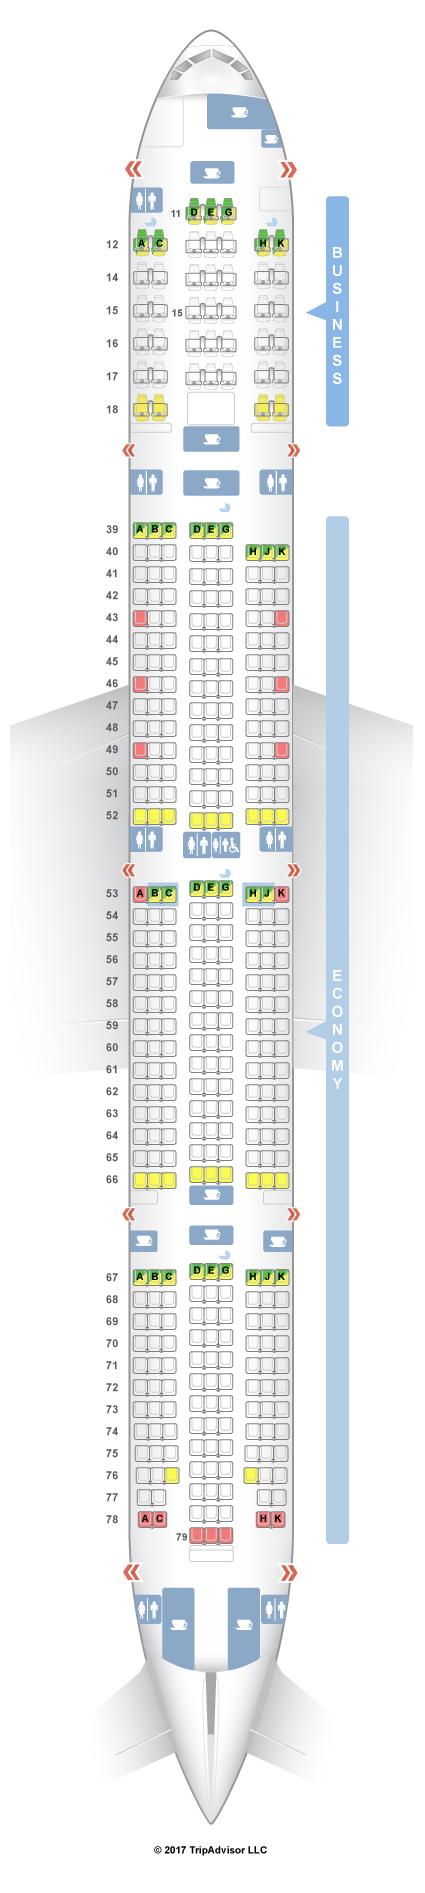 cathay pacific 333 seat map Seatguru Seat Map Thai Boeing 777300 773 Induced Info cathay pacific 333 seat map